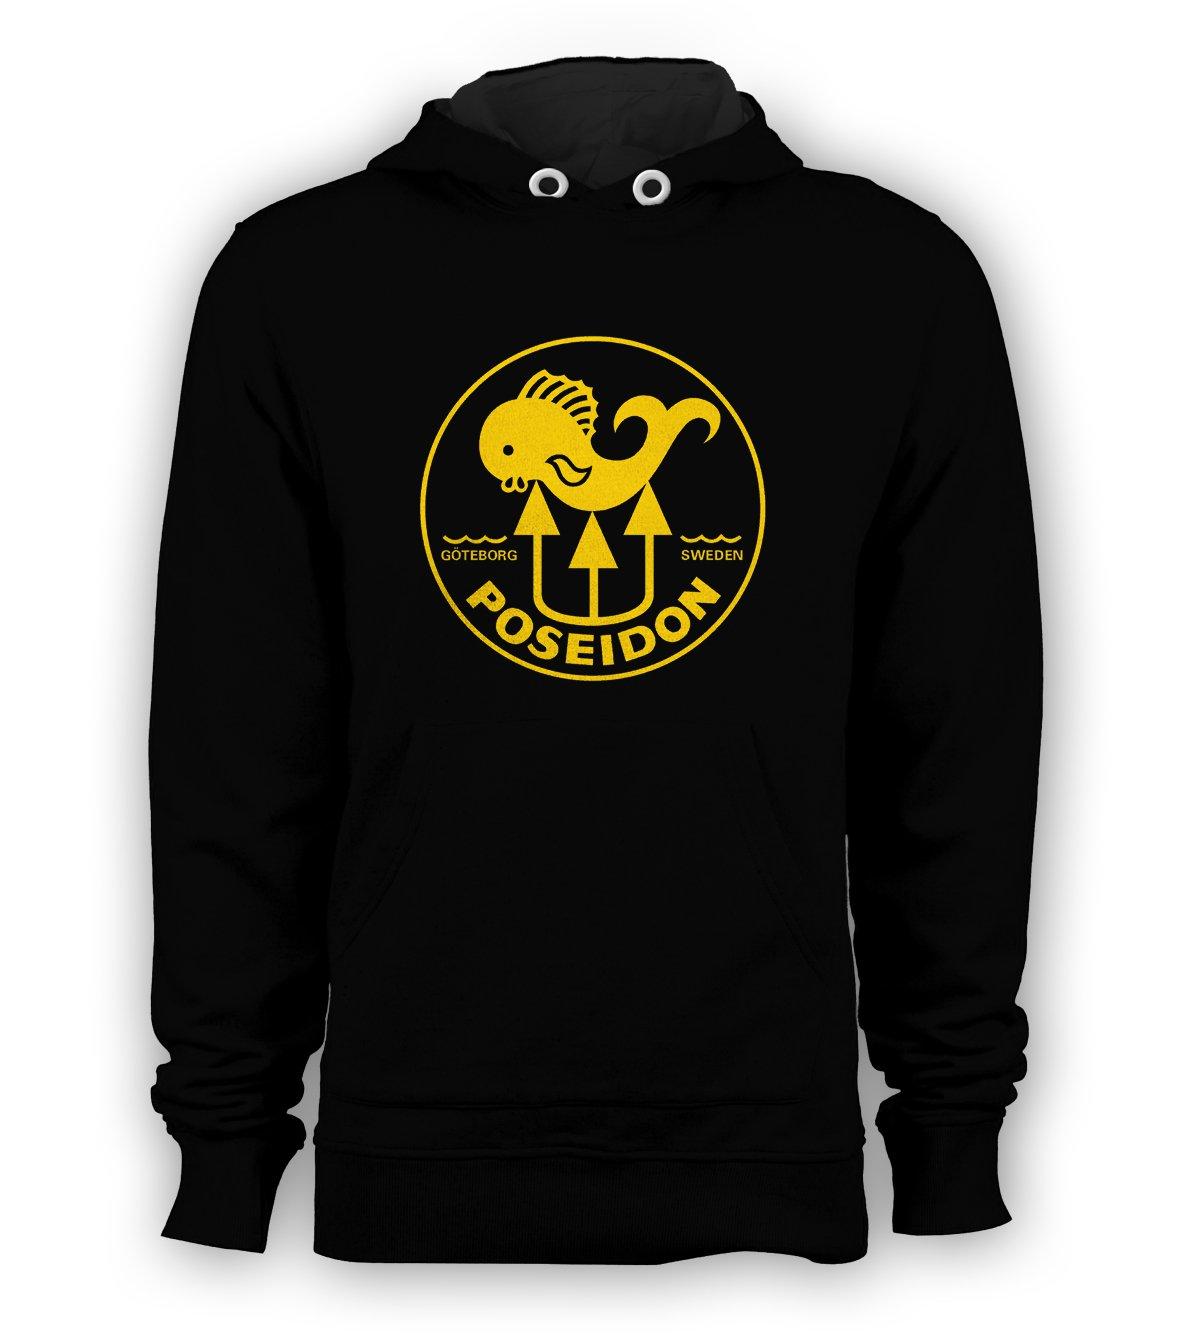 POSEIDON Scuba Diving Logo Pullover Hoodie Men Sweatshirt Black Hooded New